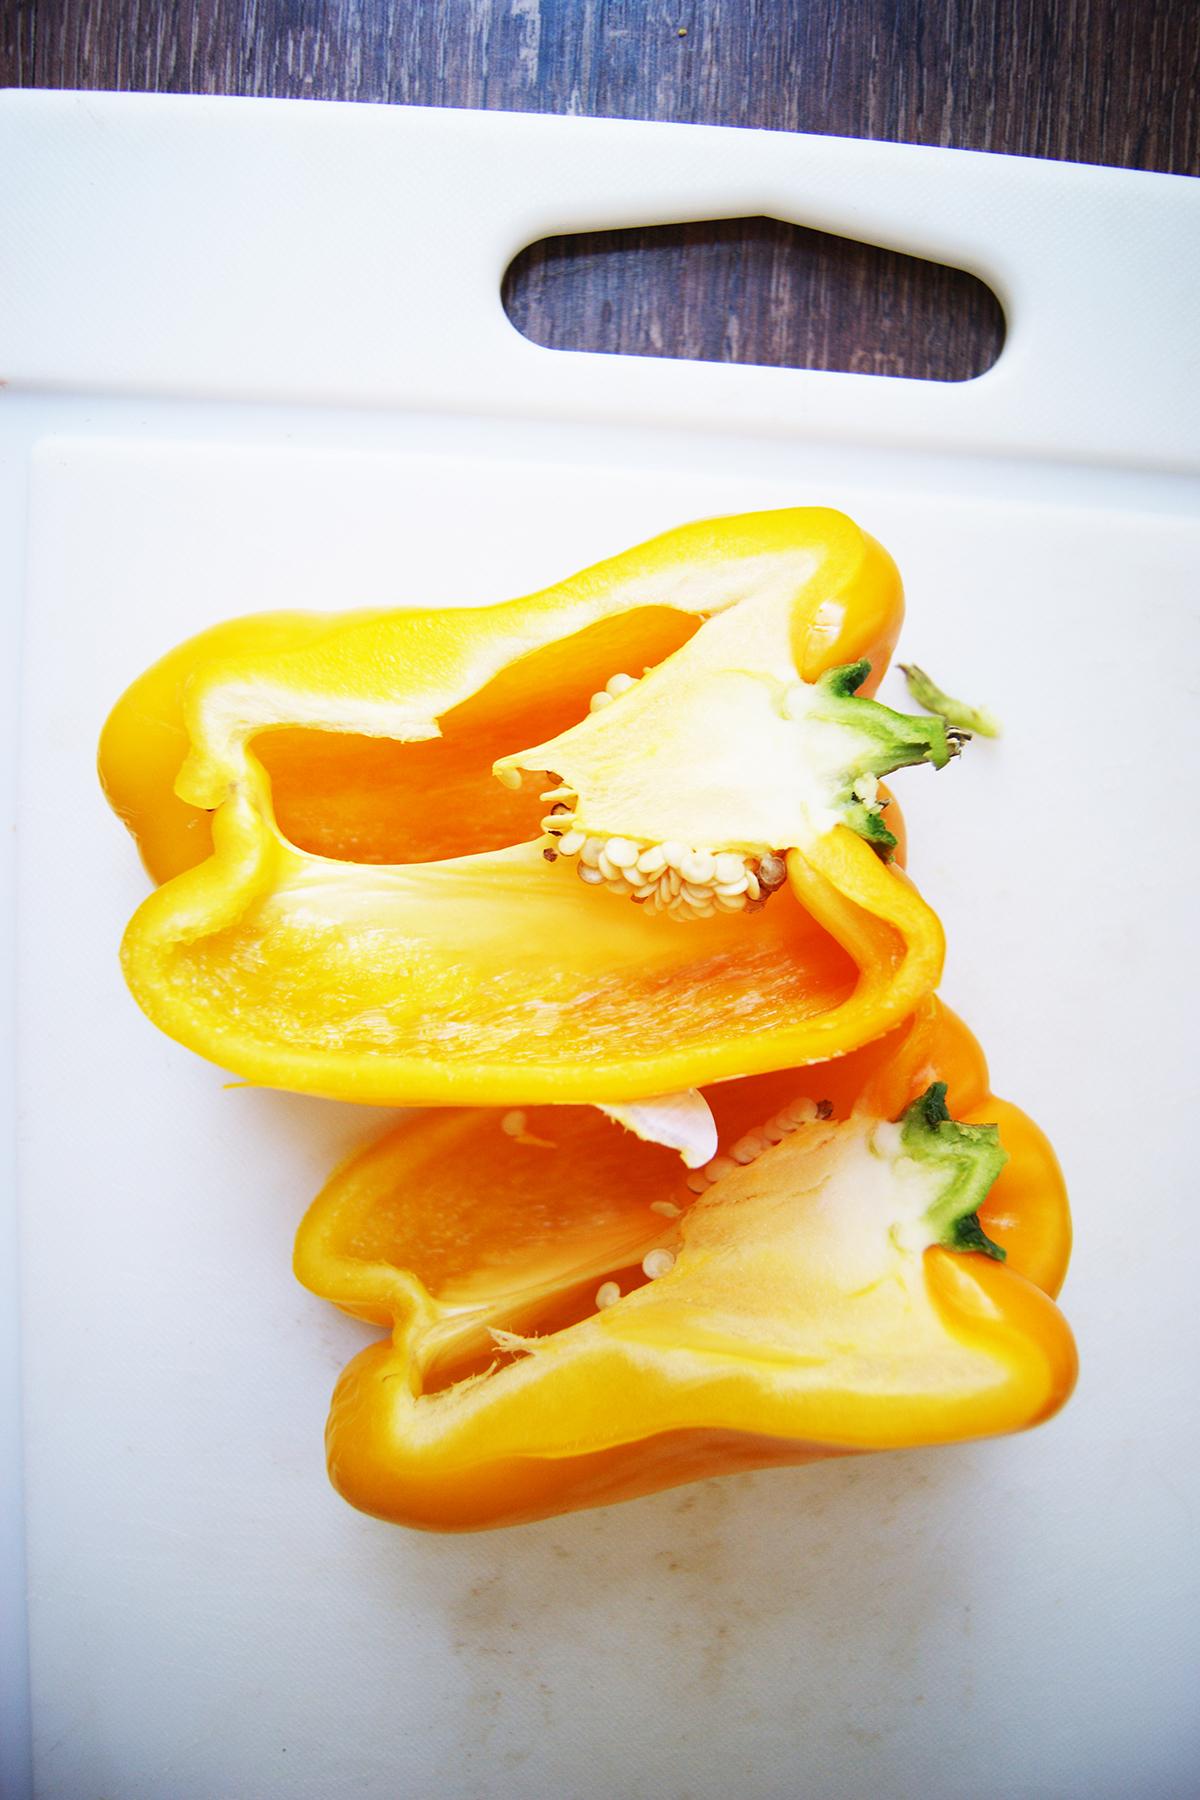 Avocado & yellow pepper Hummus recipe